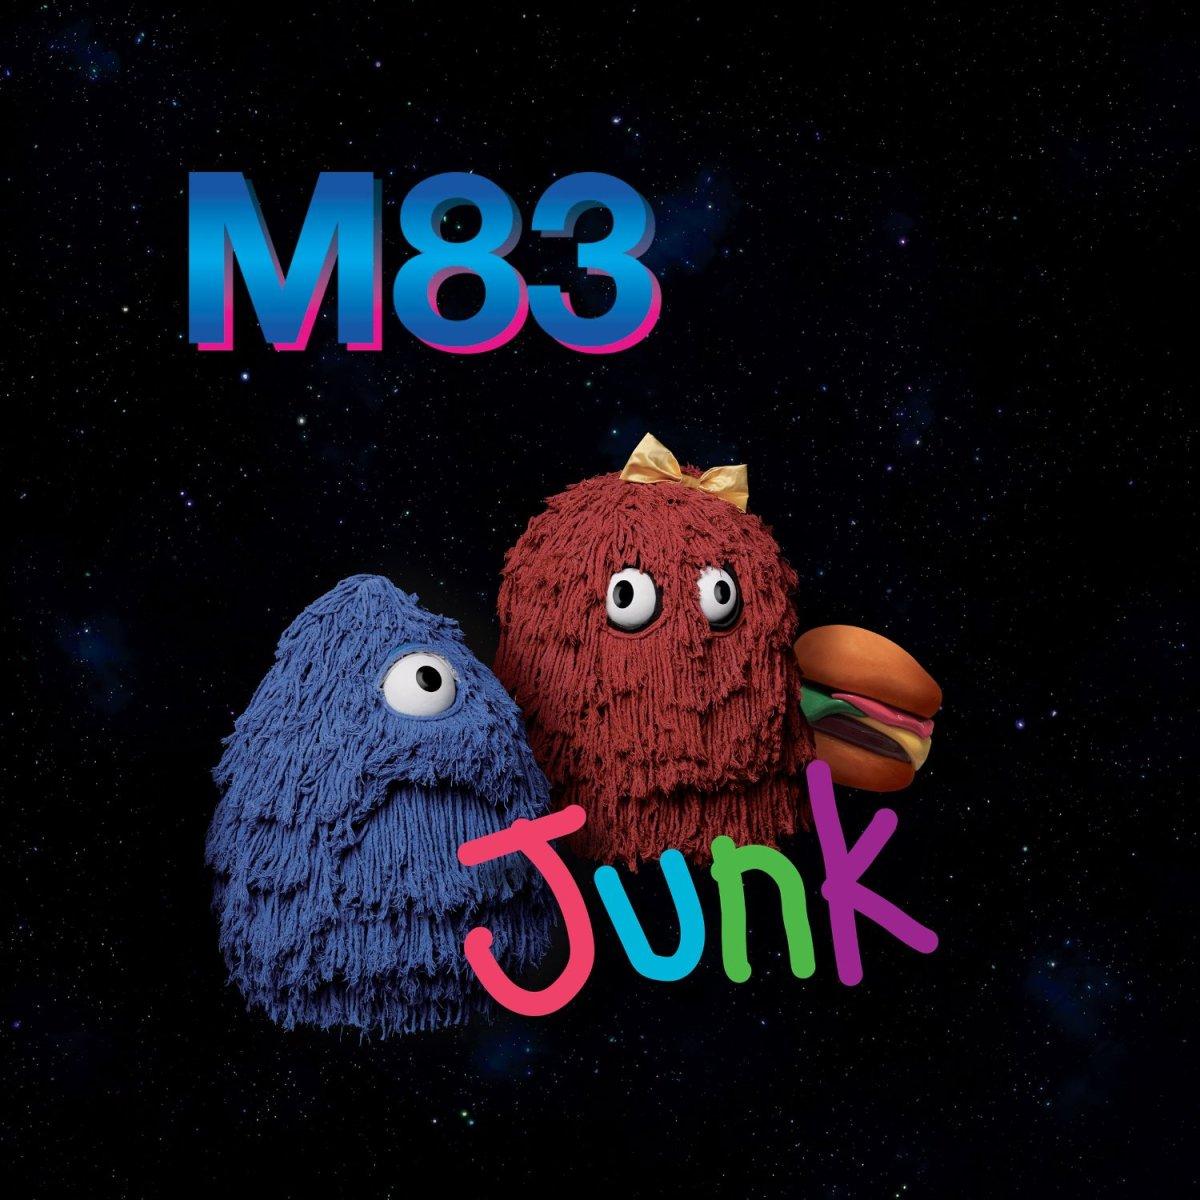 M83junk.jpg